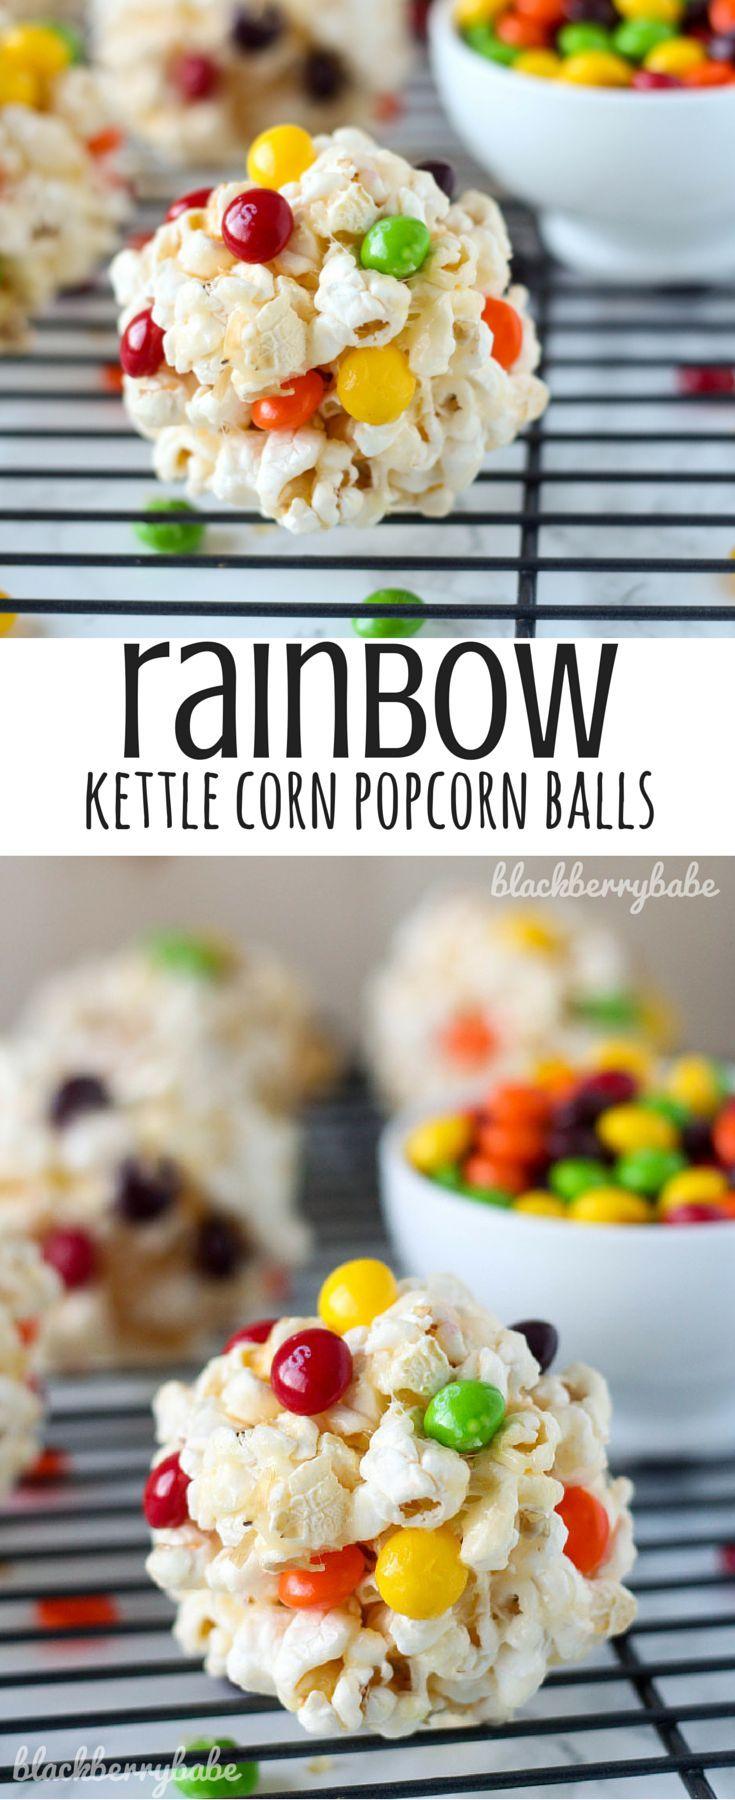 Rainbow Kettle Corn Popcorn Balls #popcornballs